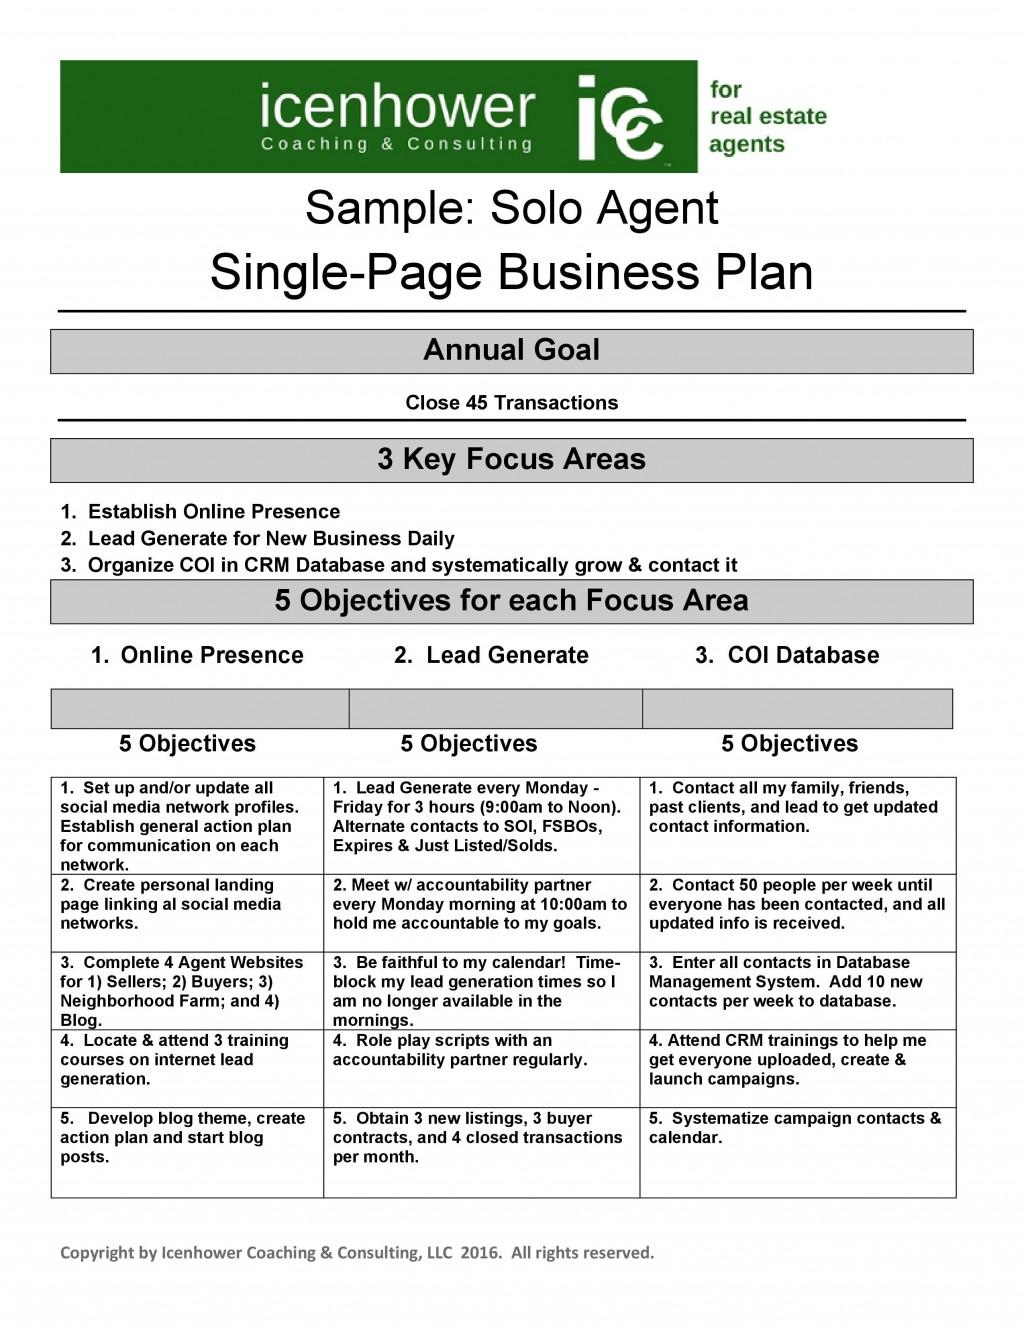 007 Astounding Real Estate Busines Plan Template Image  Example Free InvestorLarge